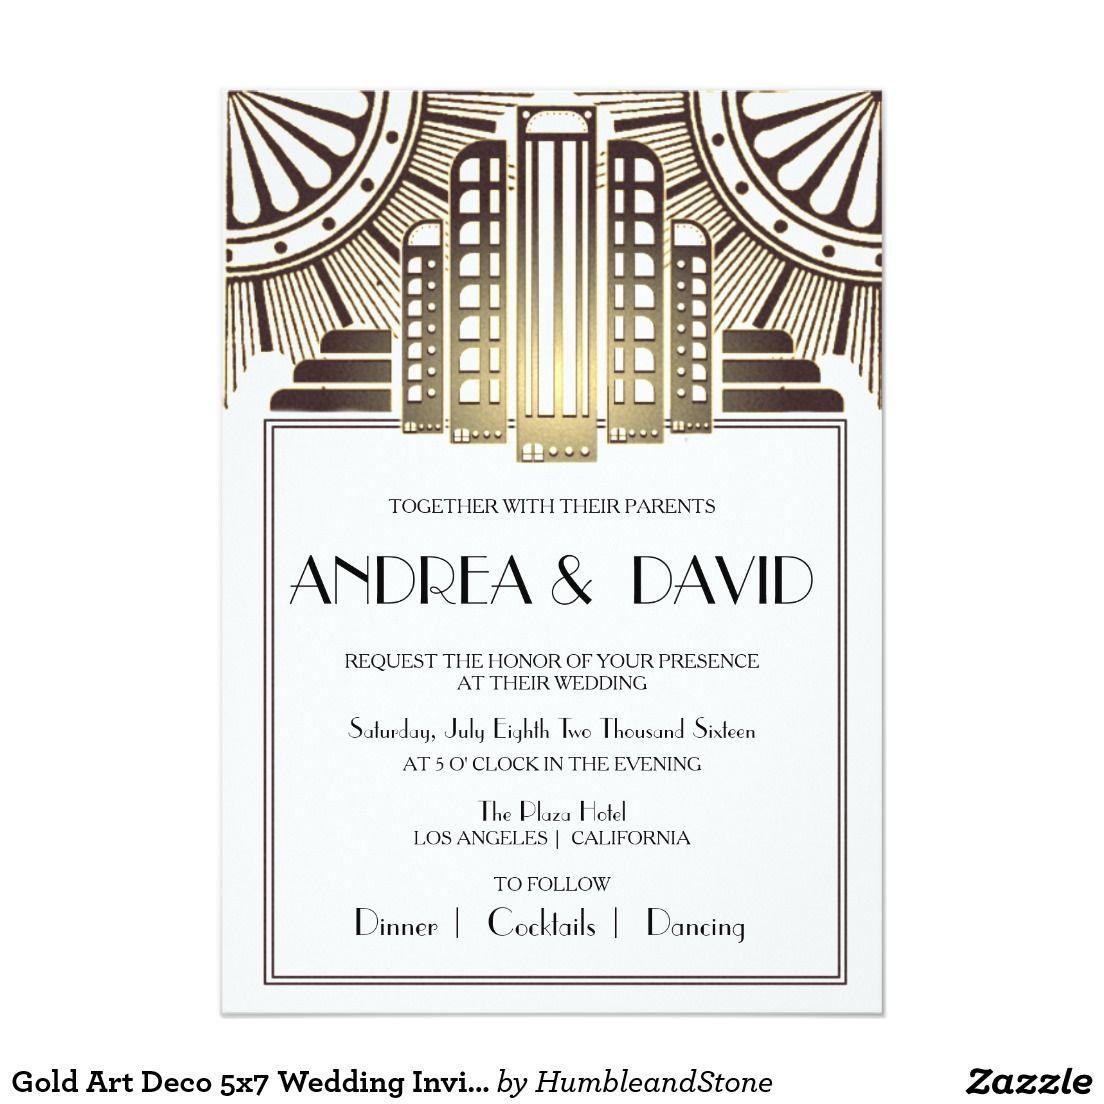 Gold Art Deco 5x7 Wedding Invitation | Gold Wedding Invitations ...